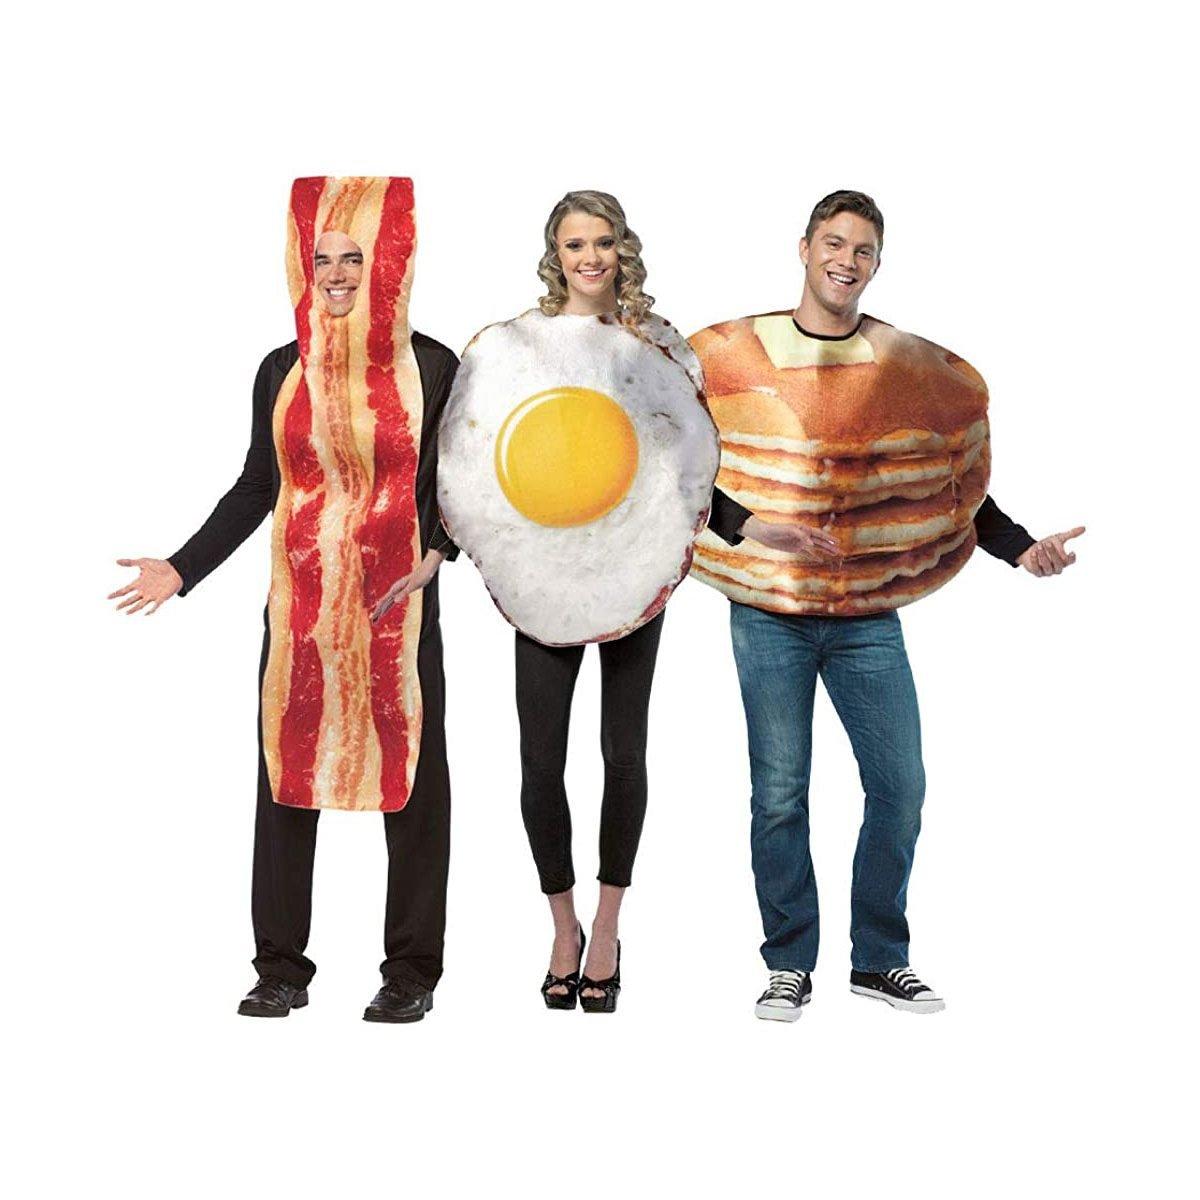 11 Best Group Halloween Costume Ideas